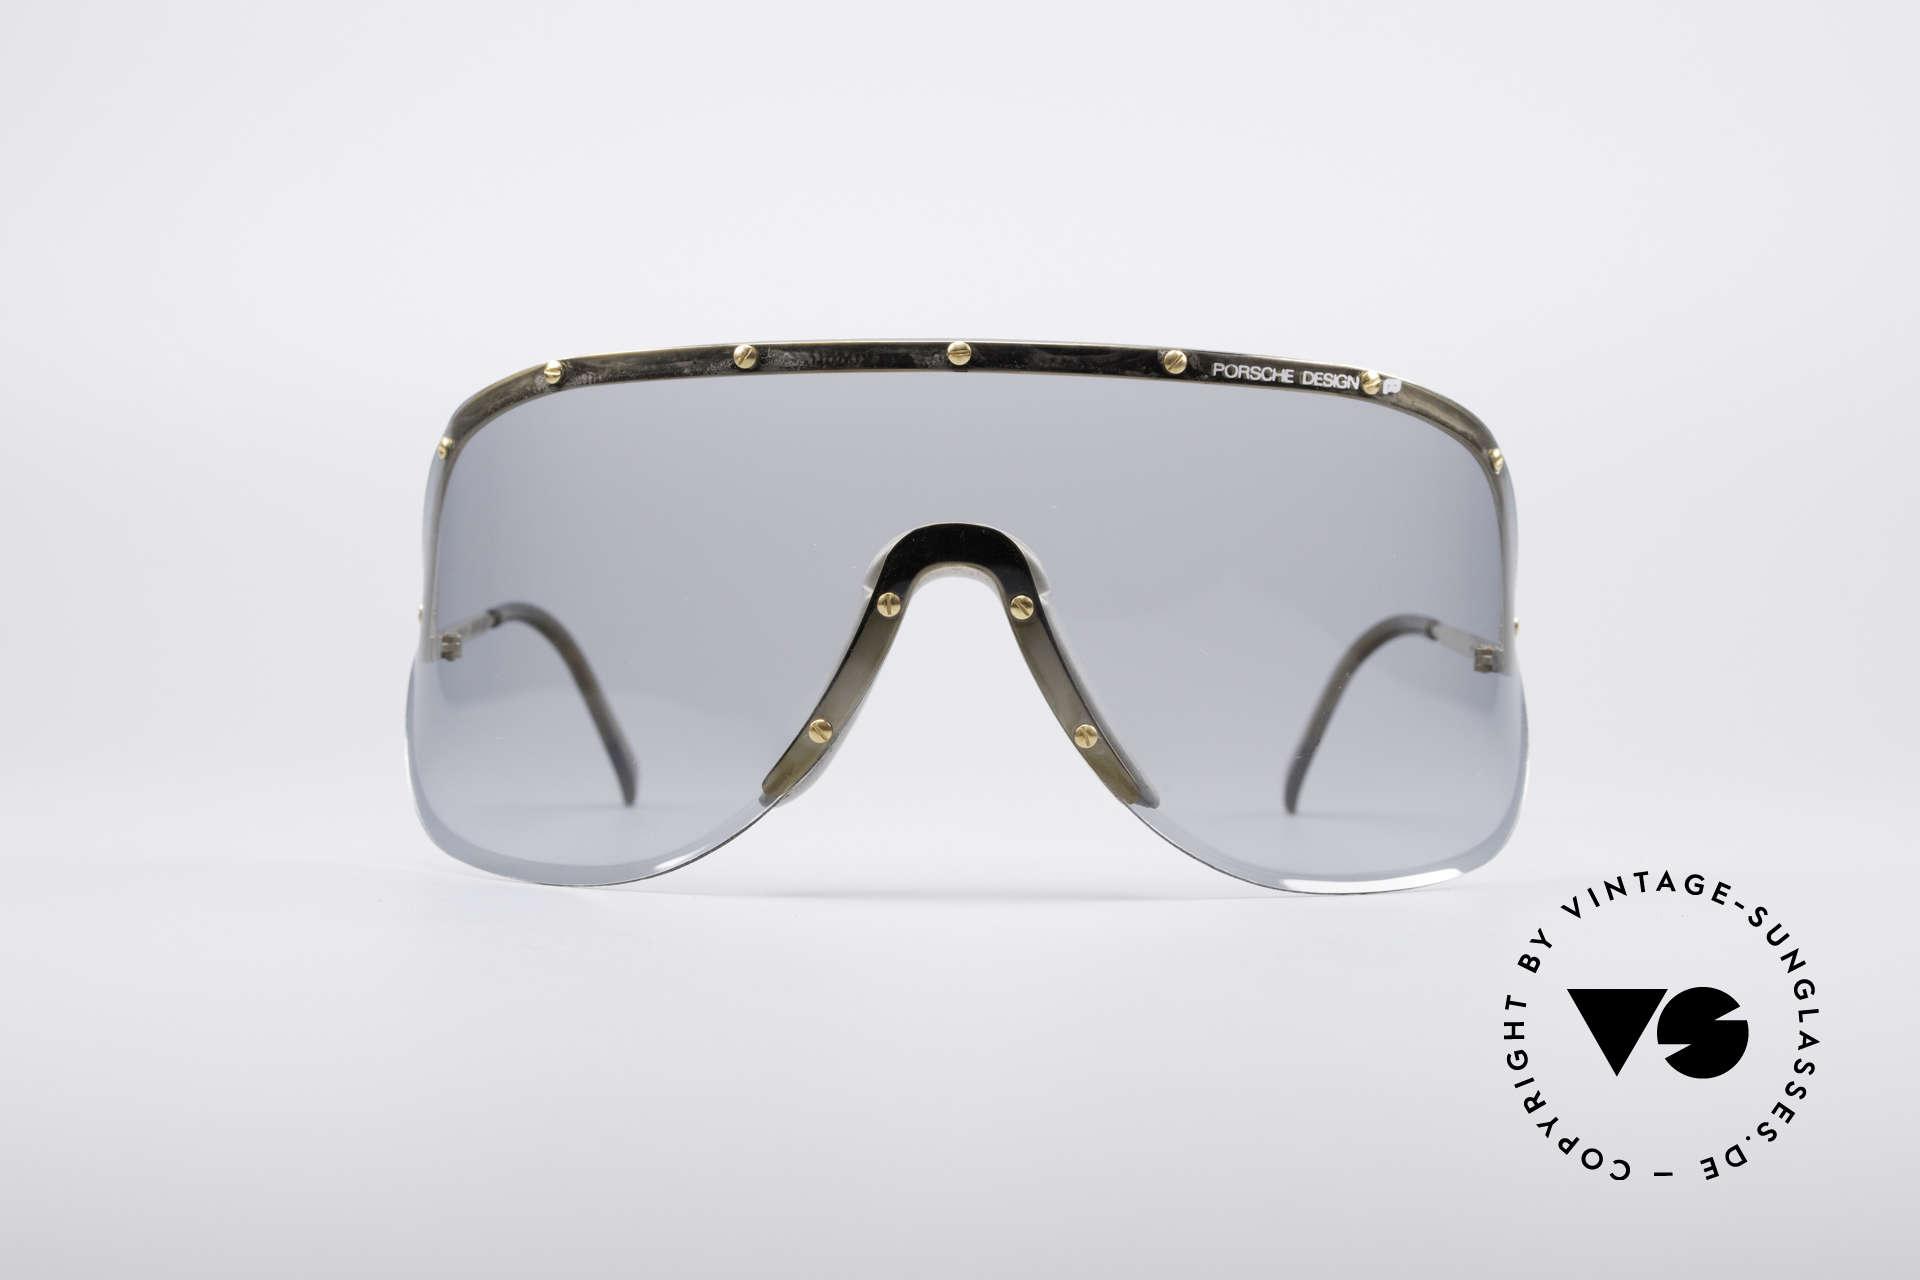 Porsche 5620 Original Yoko Ono Shades Gold, huge shades, made for a flashy appearance (eye-catcher), Made for Men and Women